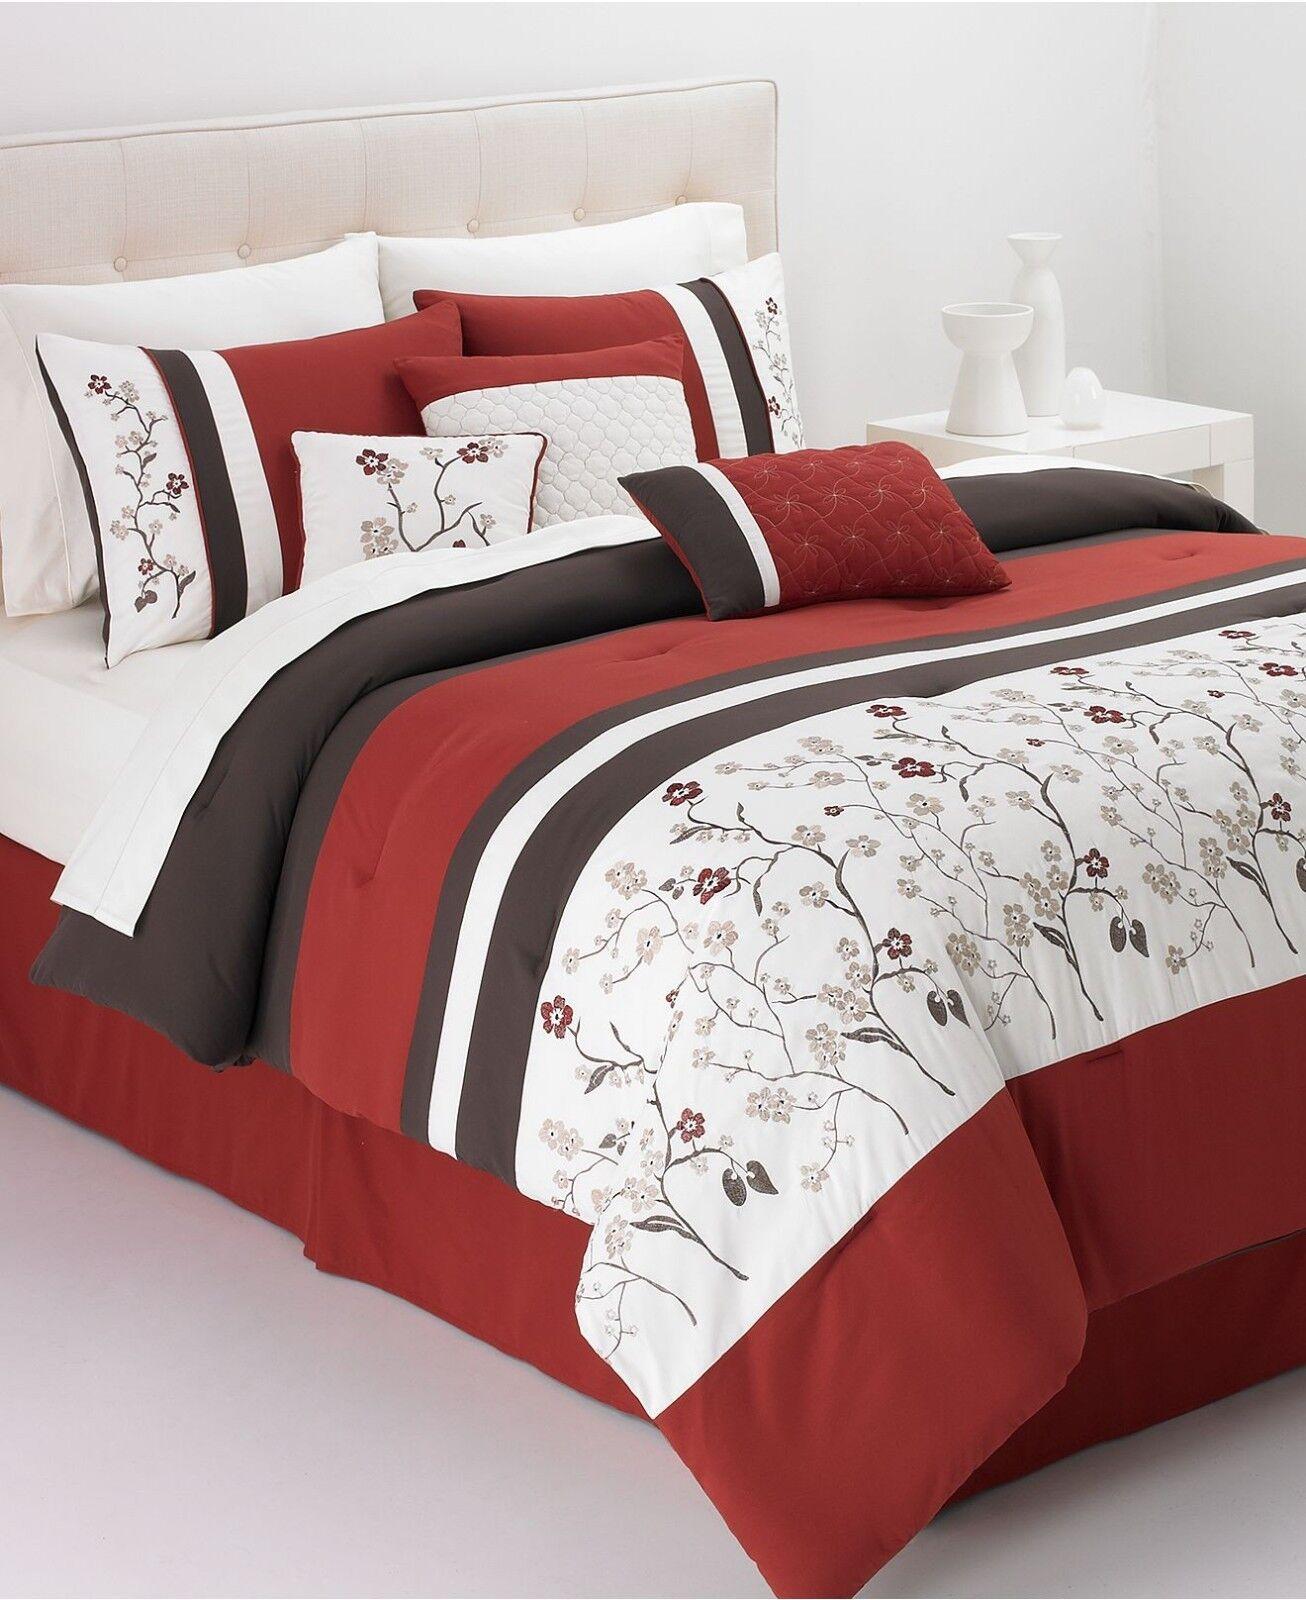 Hallmart Collectibles Bella damen 7 Piece KING Embroiderot Comforter Set T491